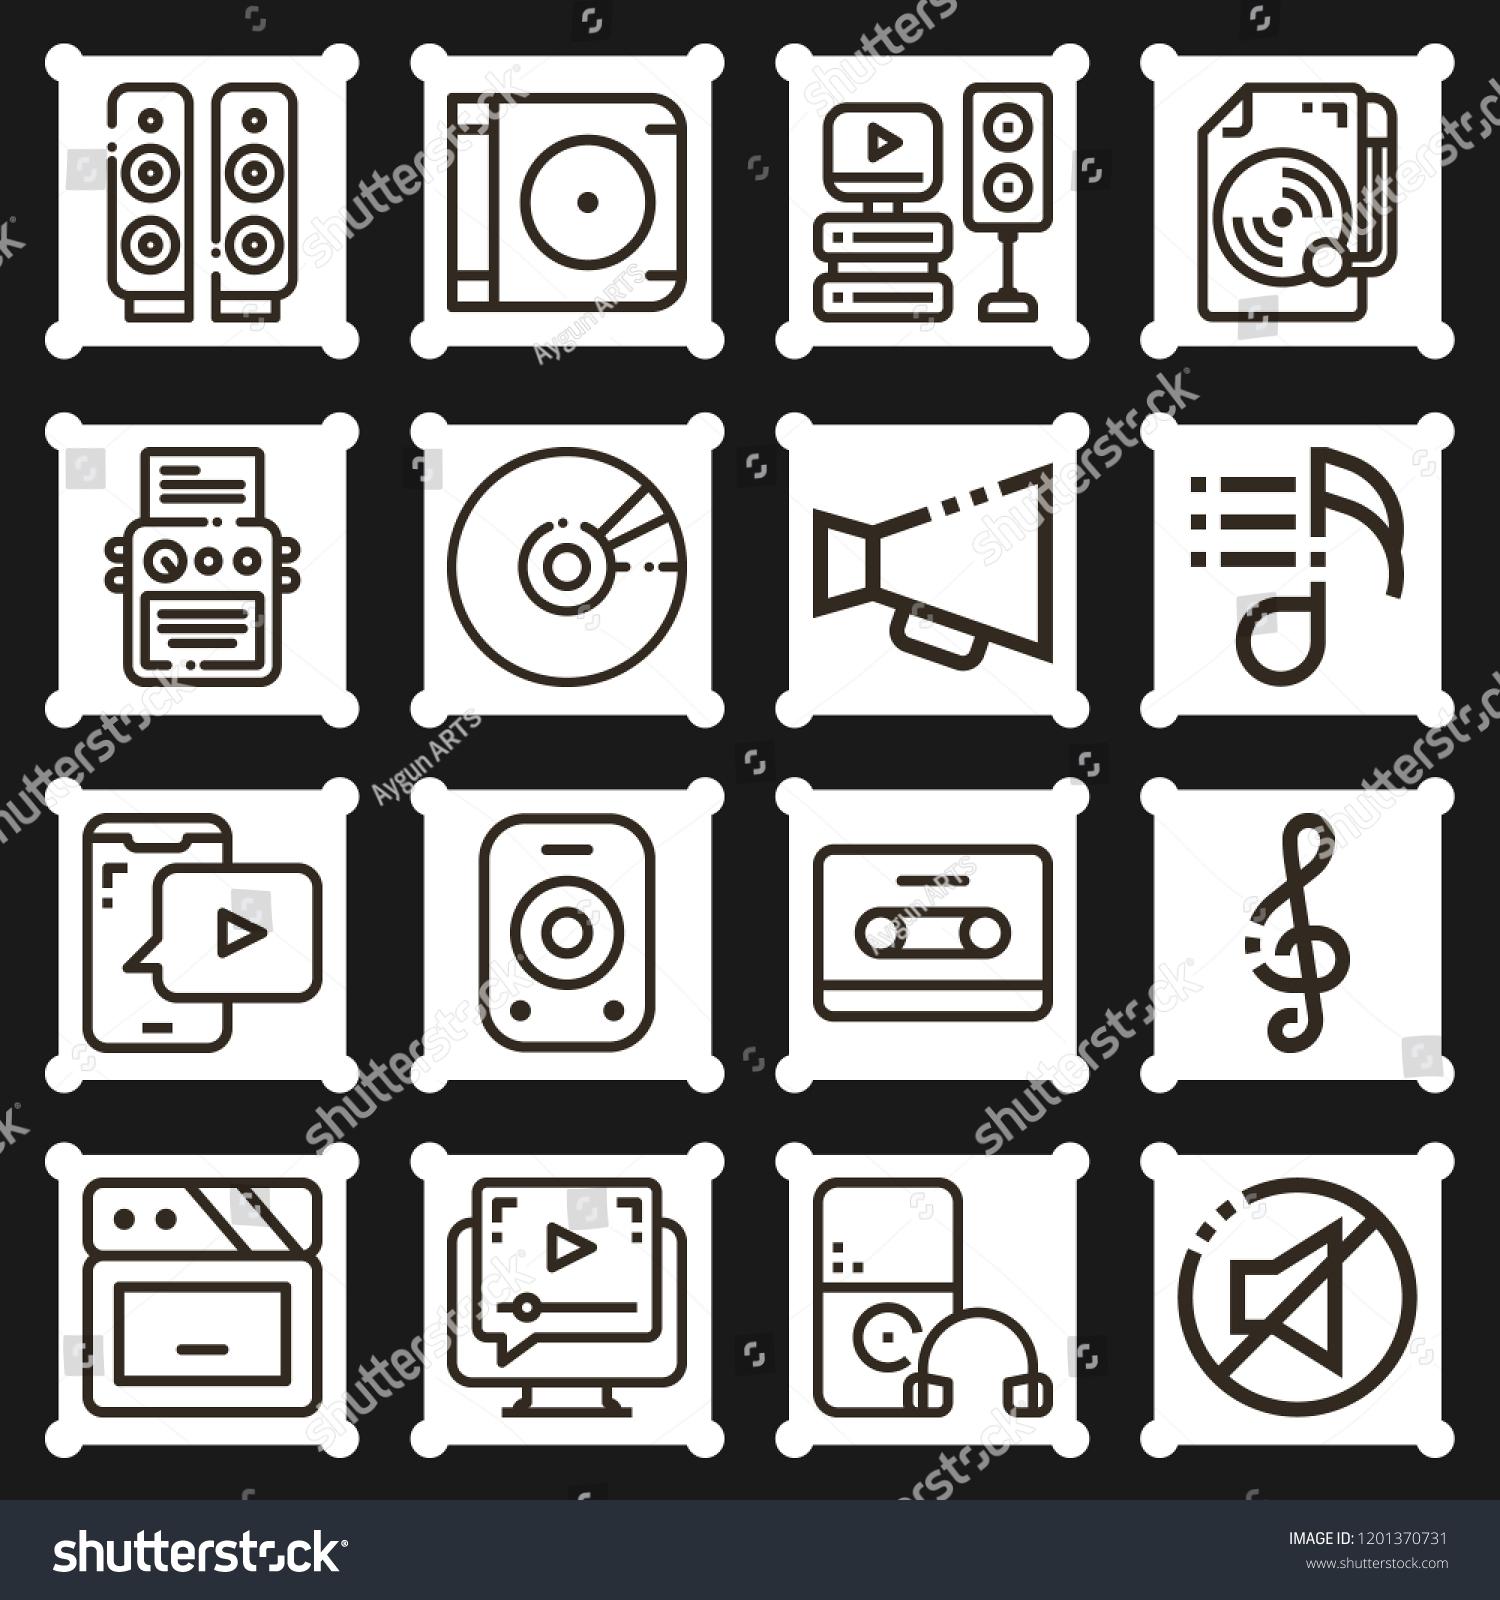 Royalty Free Stock Illustration of Cd Loudspeaker Sound